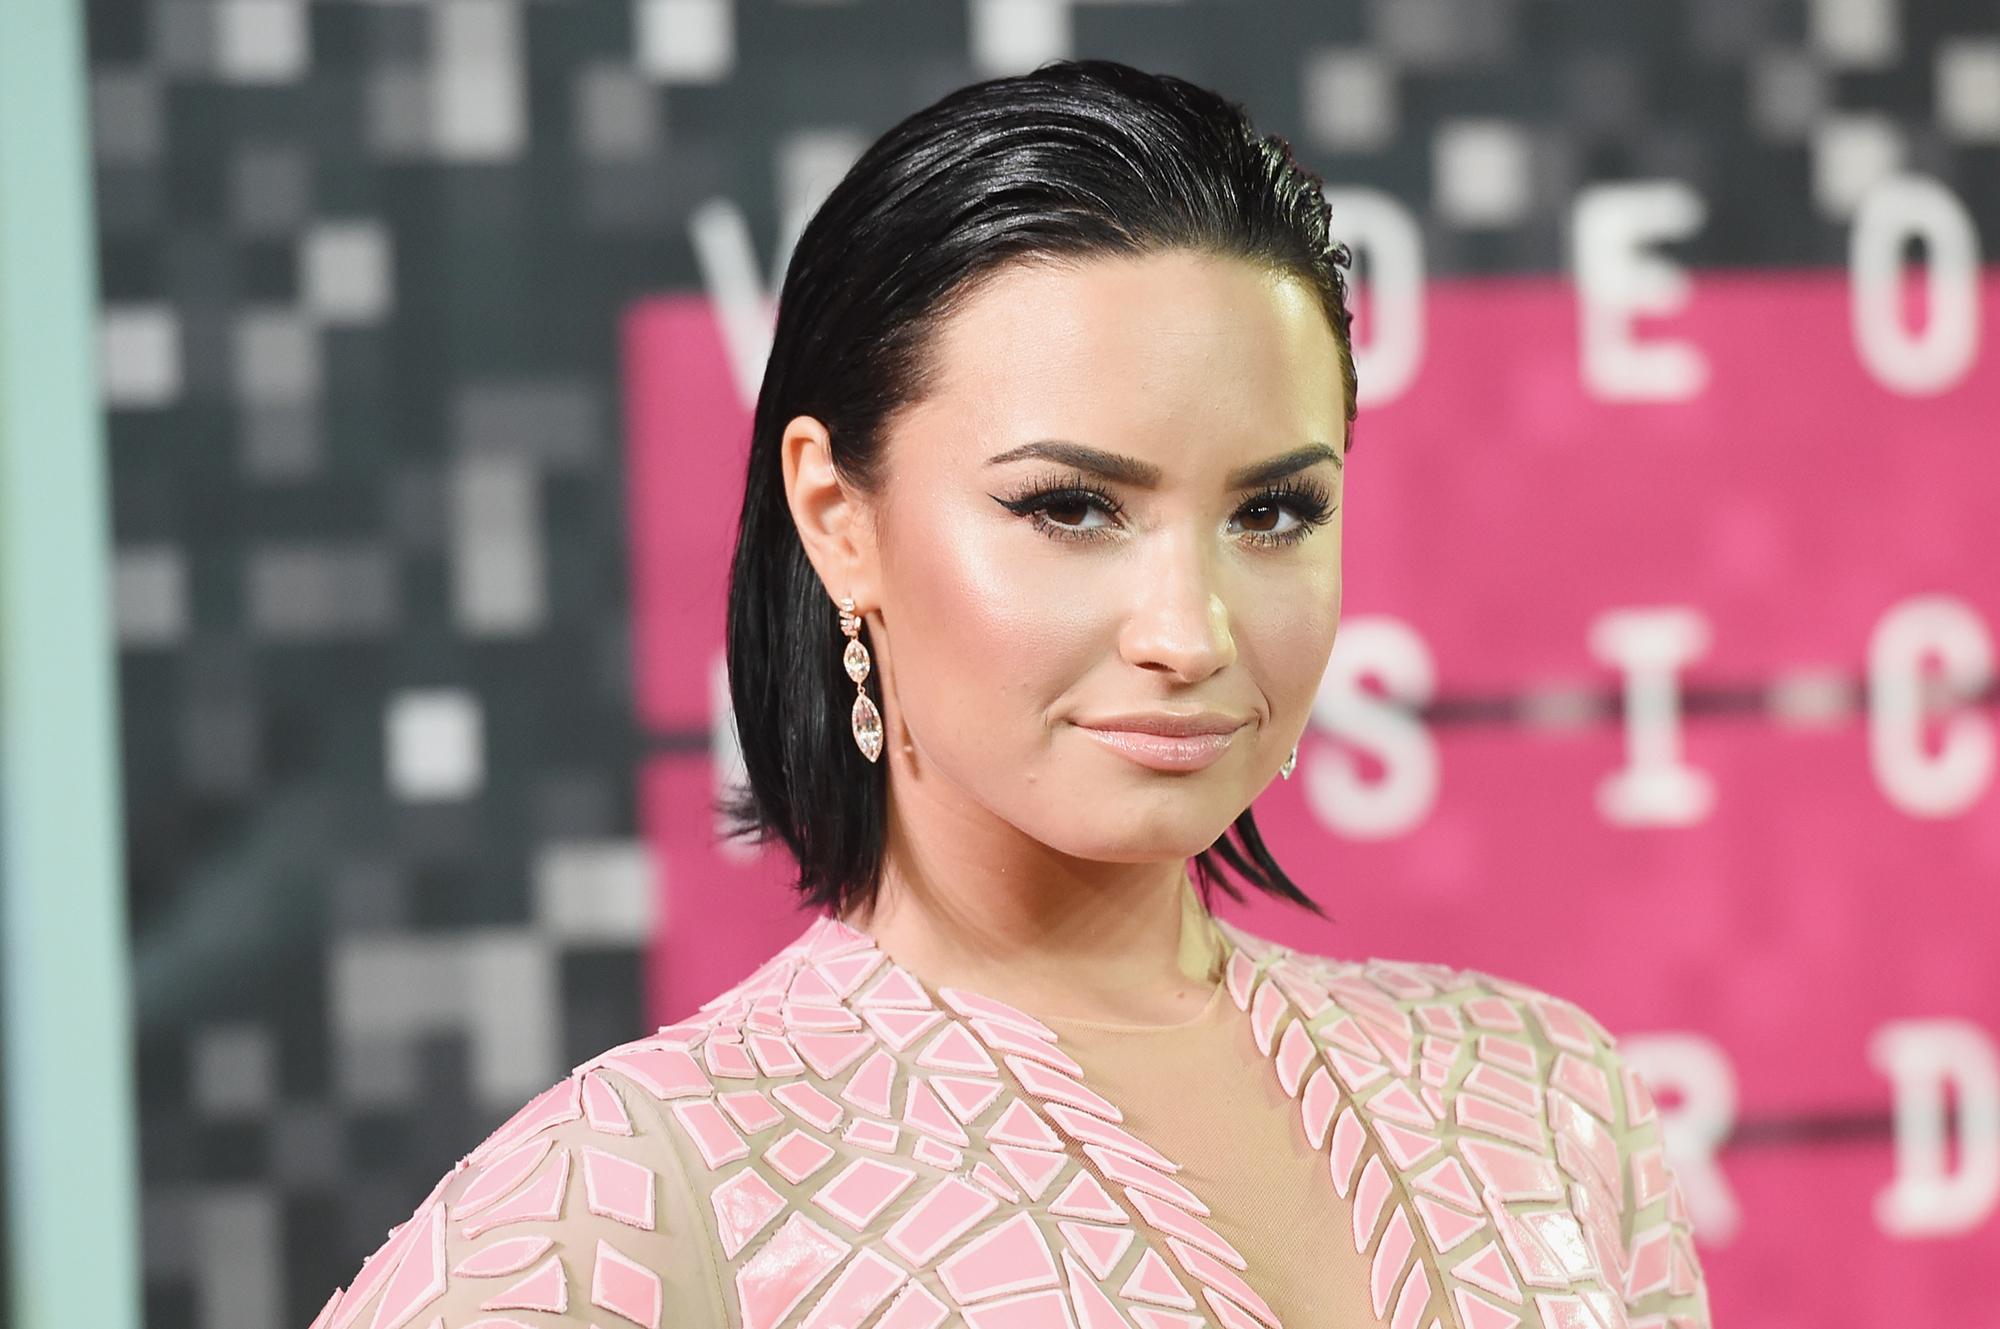 5c19f327b Demi Lovato Begins 'Aggressive' Rehab After Overdose, Hospitalization